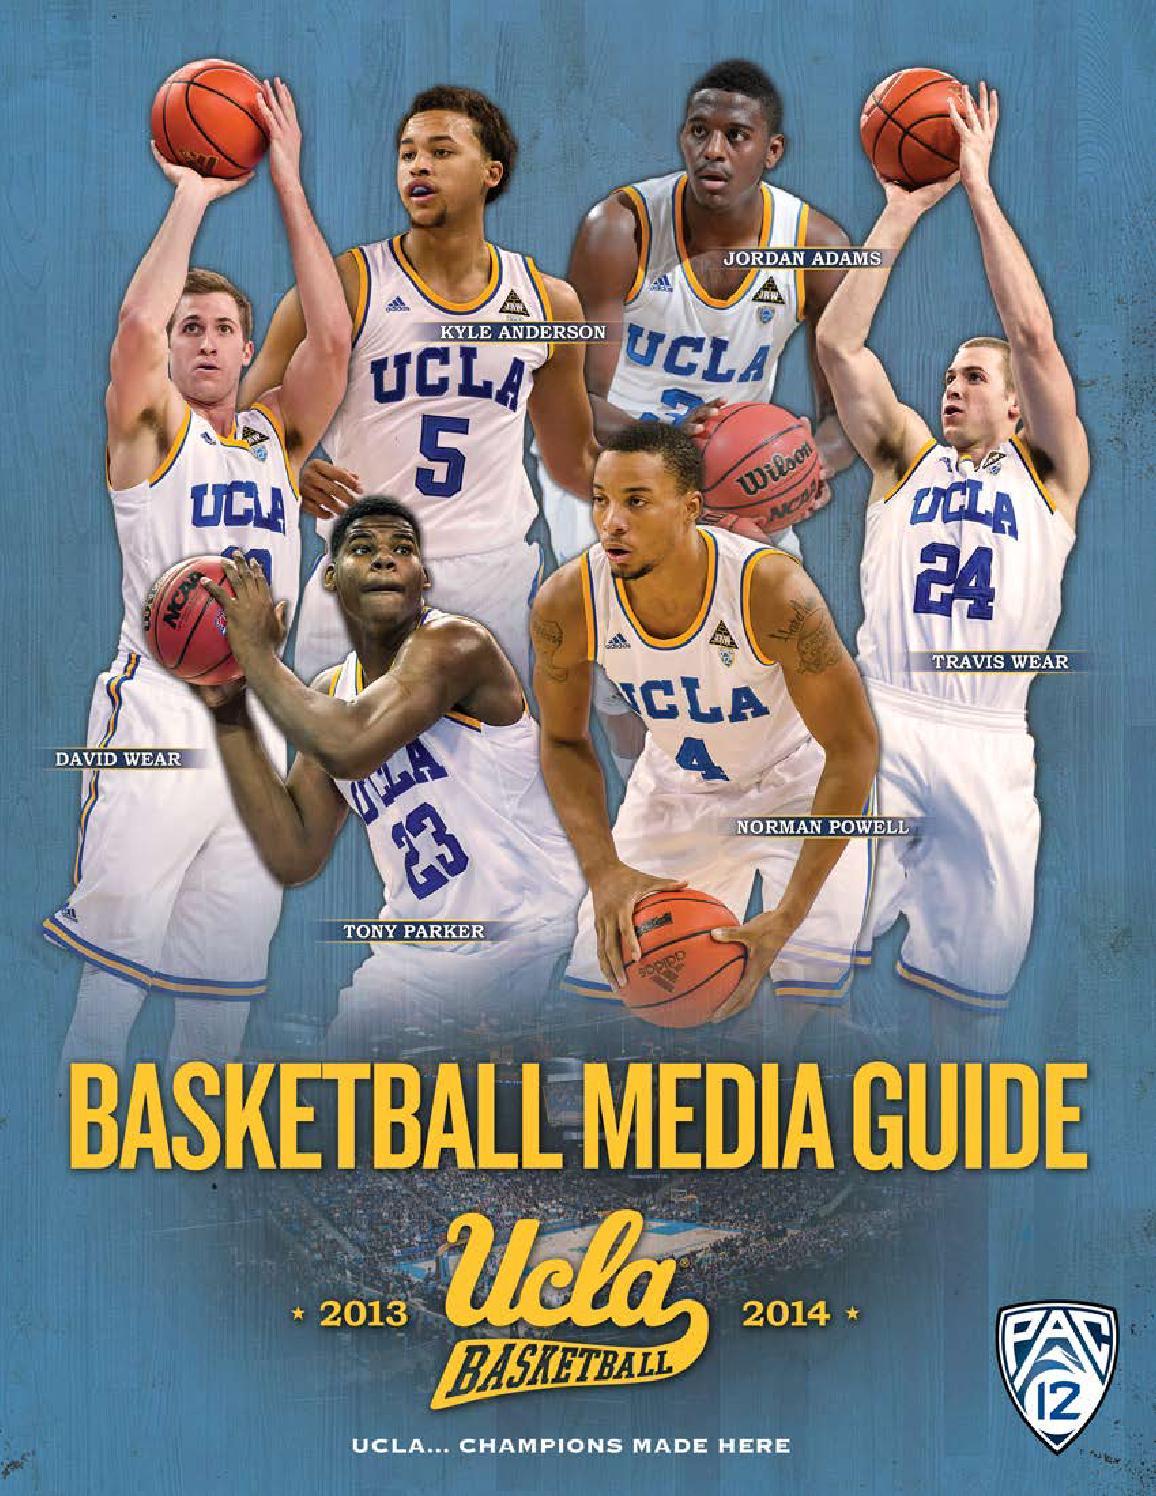 2013-14 UCLA Men's Basketball Media Guide by UCLA Athletics - issuu